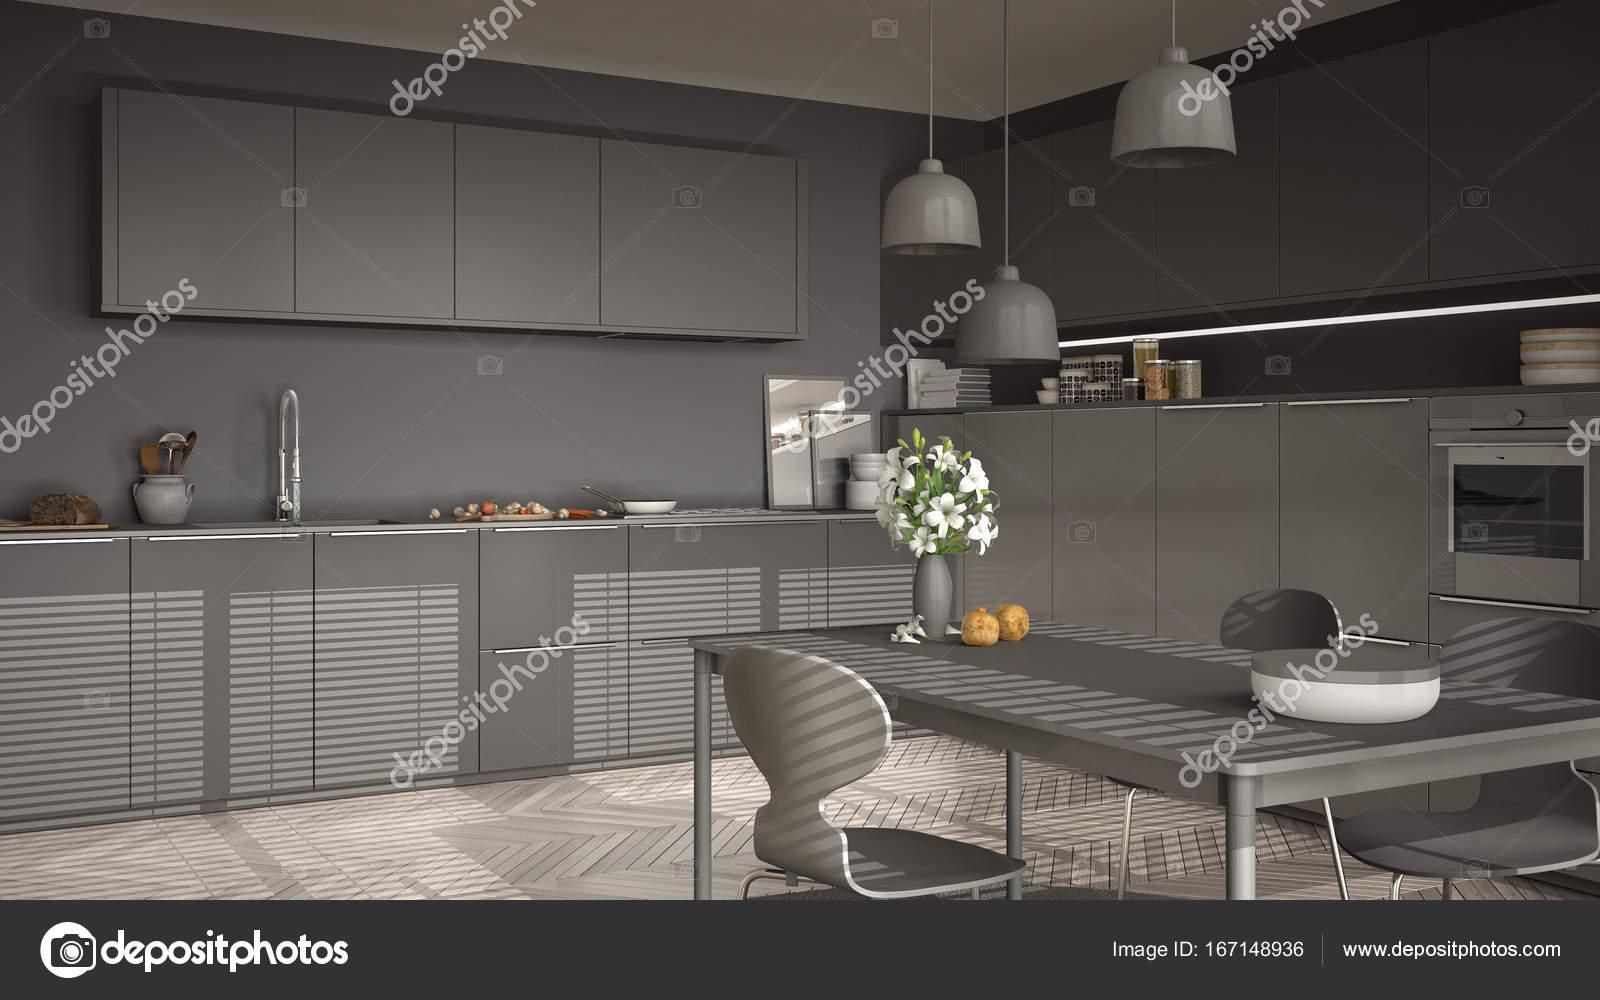 modern kitchen table commercial kitchens 现代厨房的桌子和椅子 大窗户和herringbon 图库照片 c archiviz 167148936